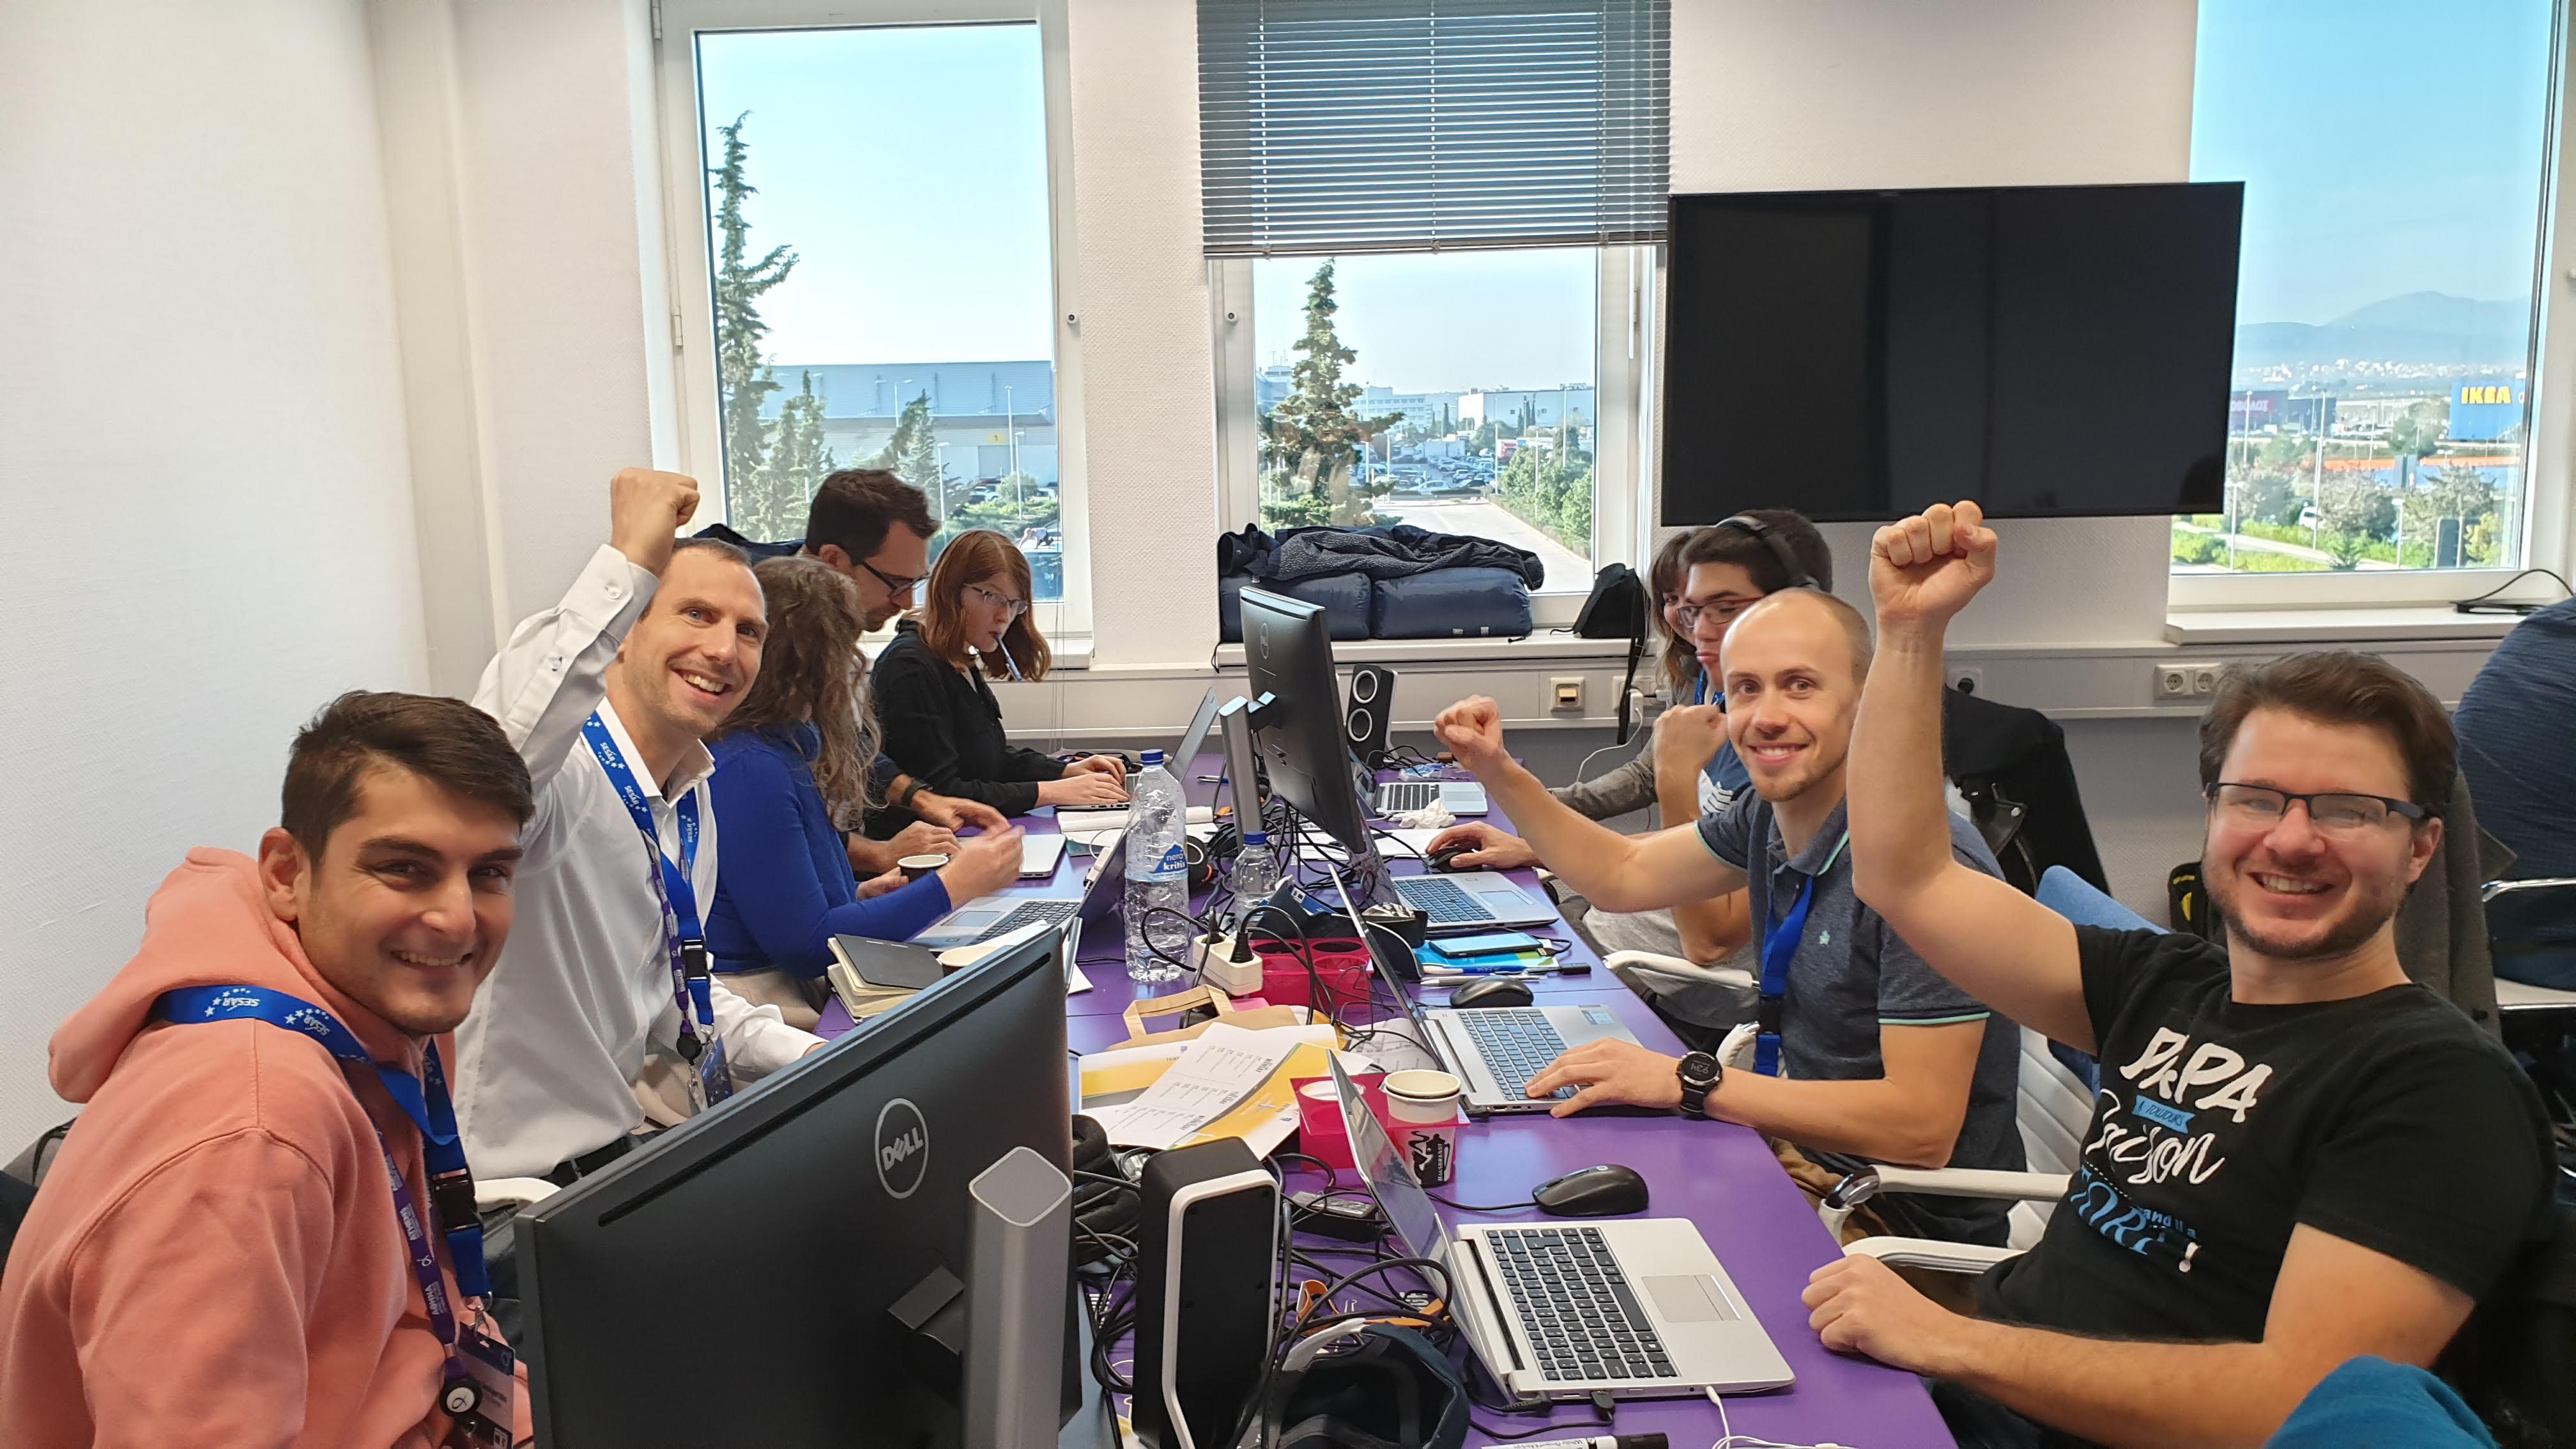 Participants at the ACI Digital Sky Challenge